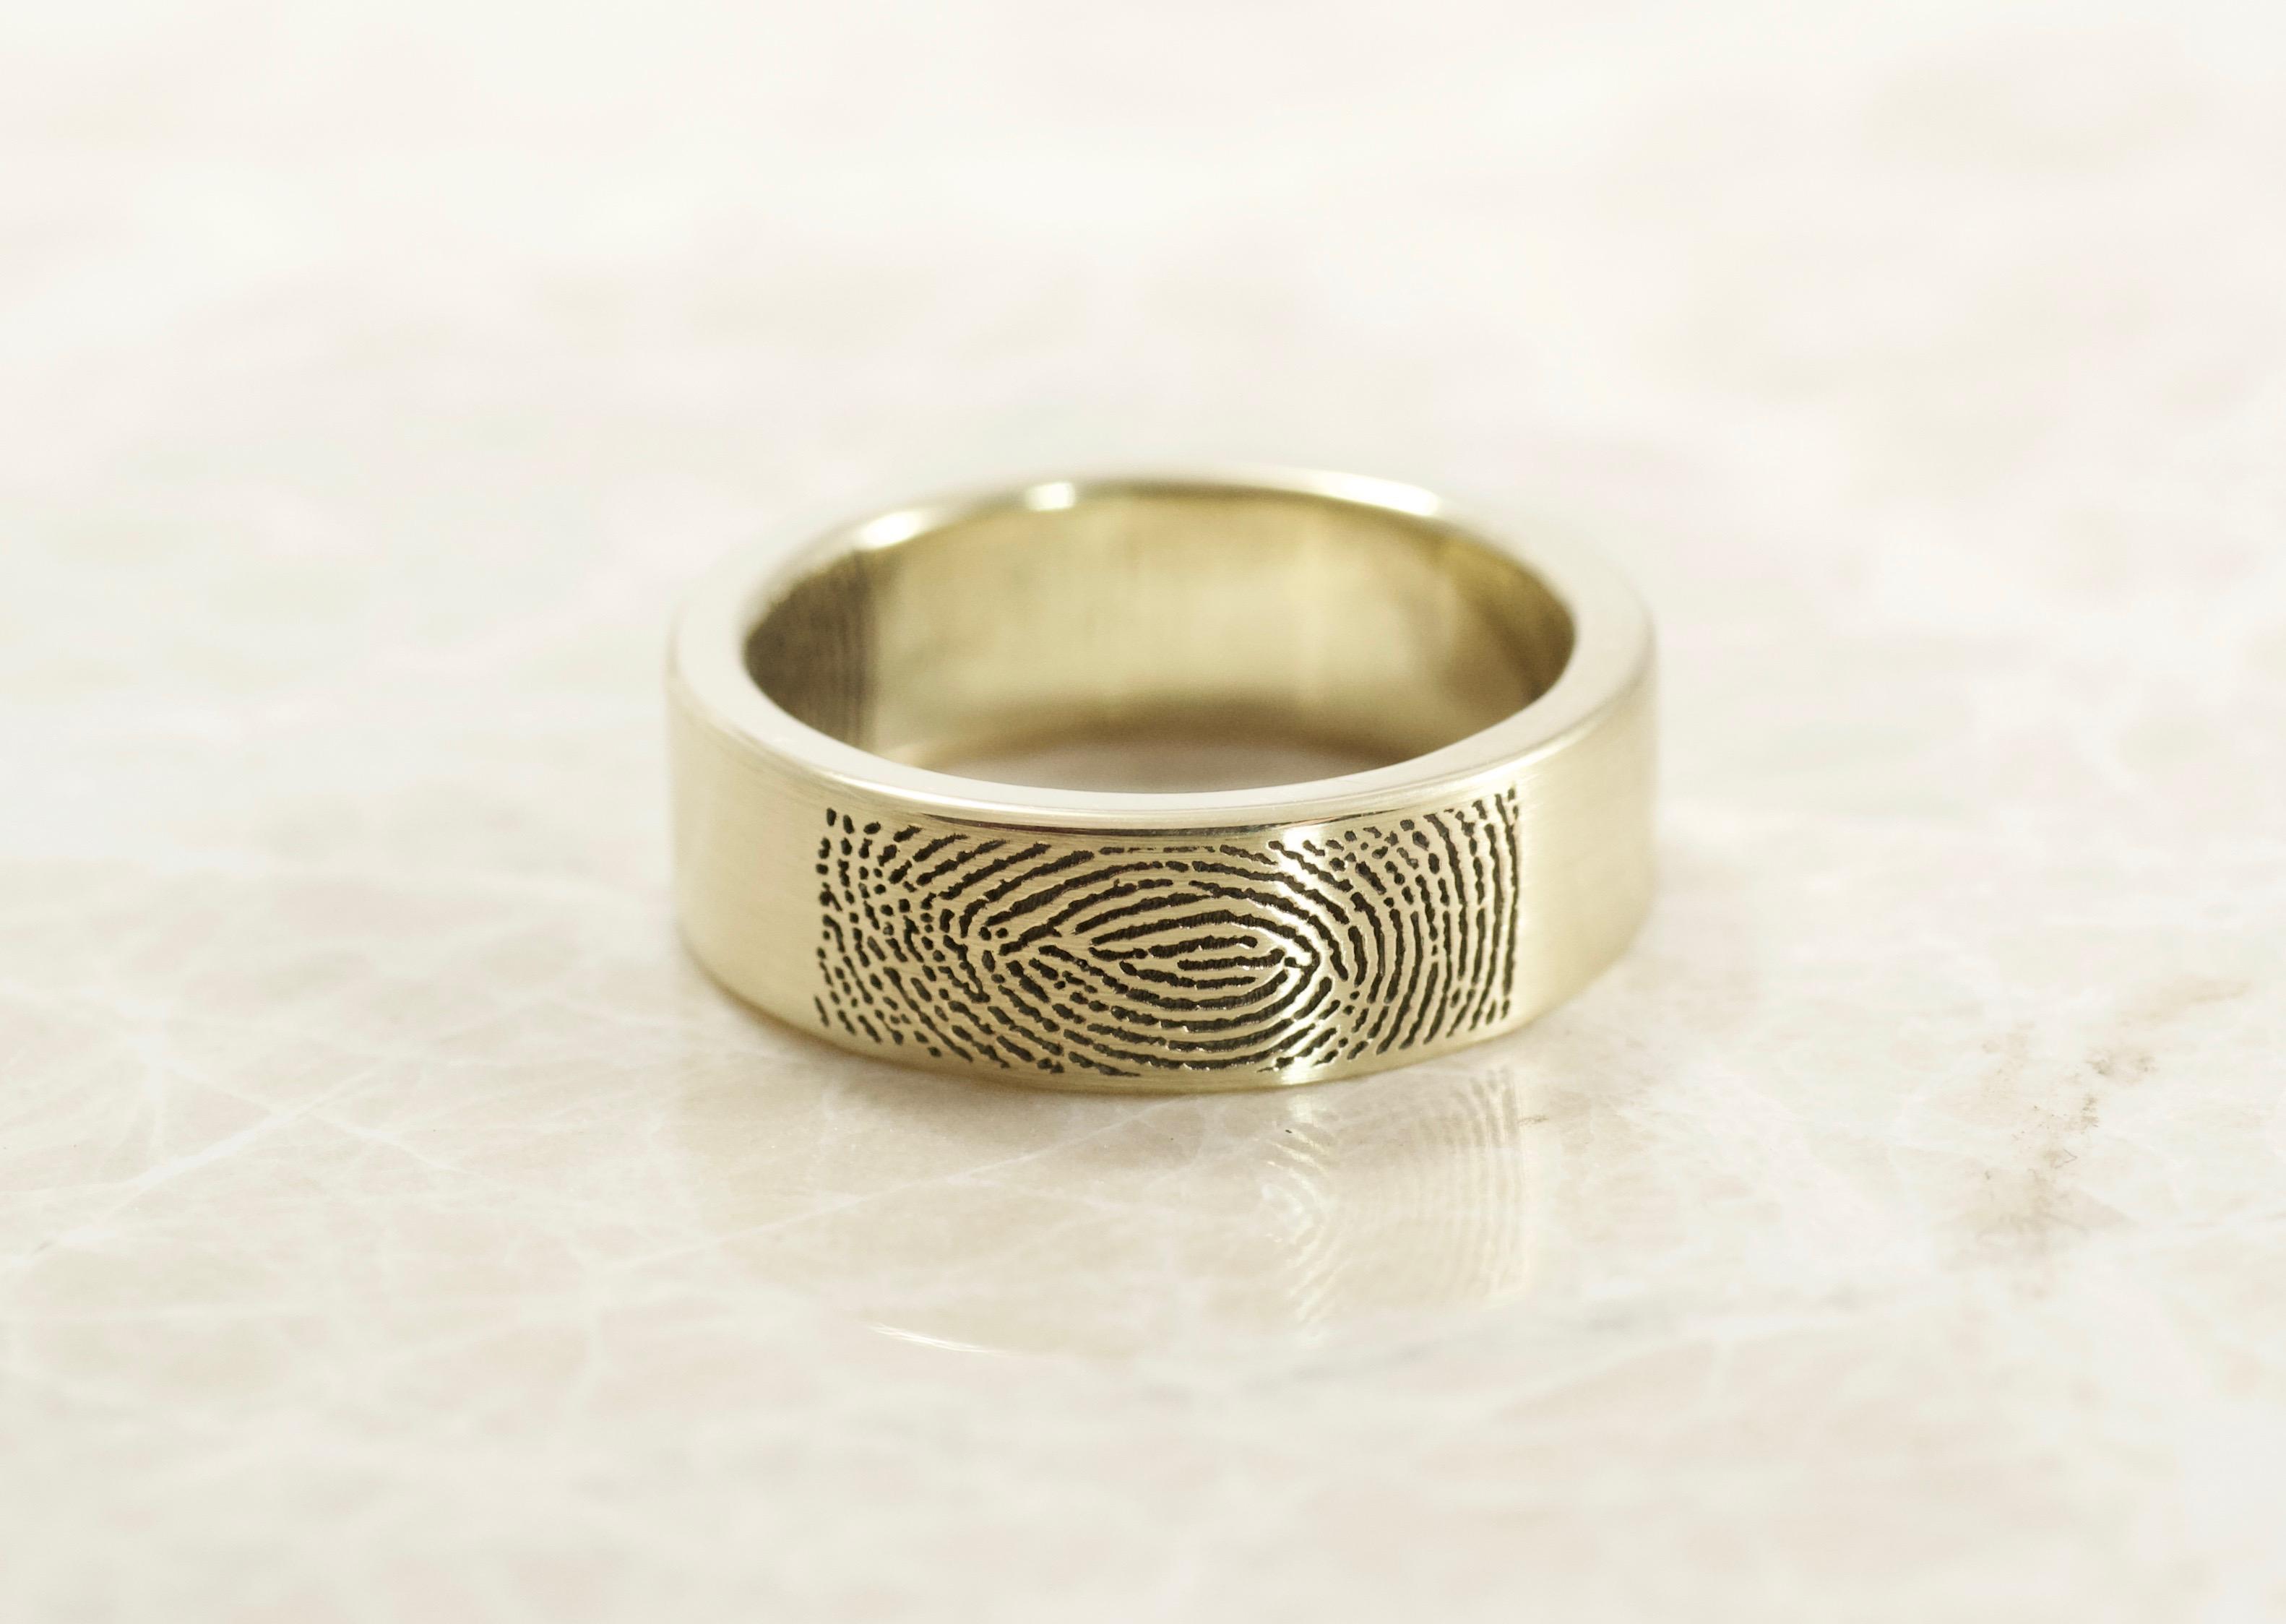 Custom Flat band in yellow gold fingerprint with your fingerprint